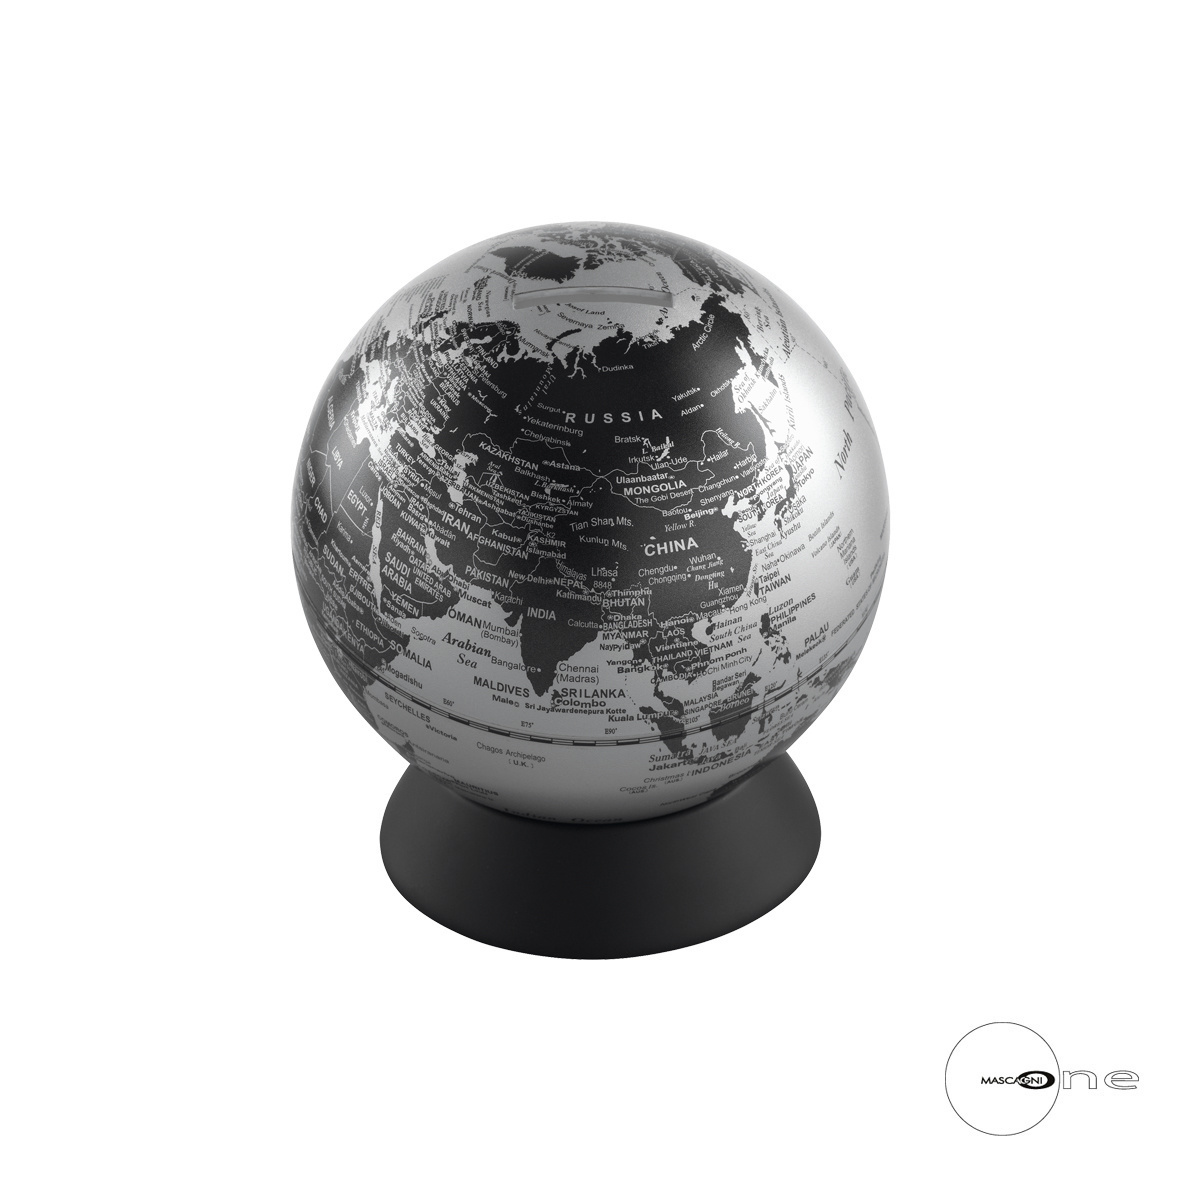 Art Mascagni O1354 GLOBE DIAM.13 - COL.BLACK